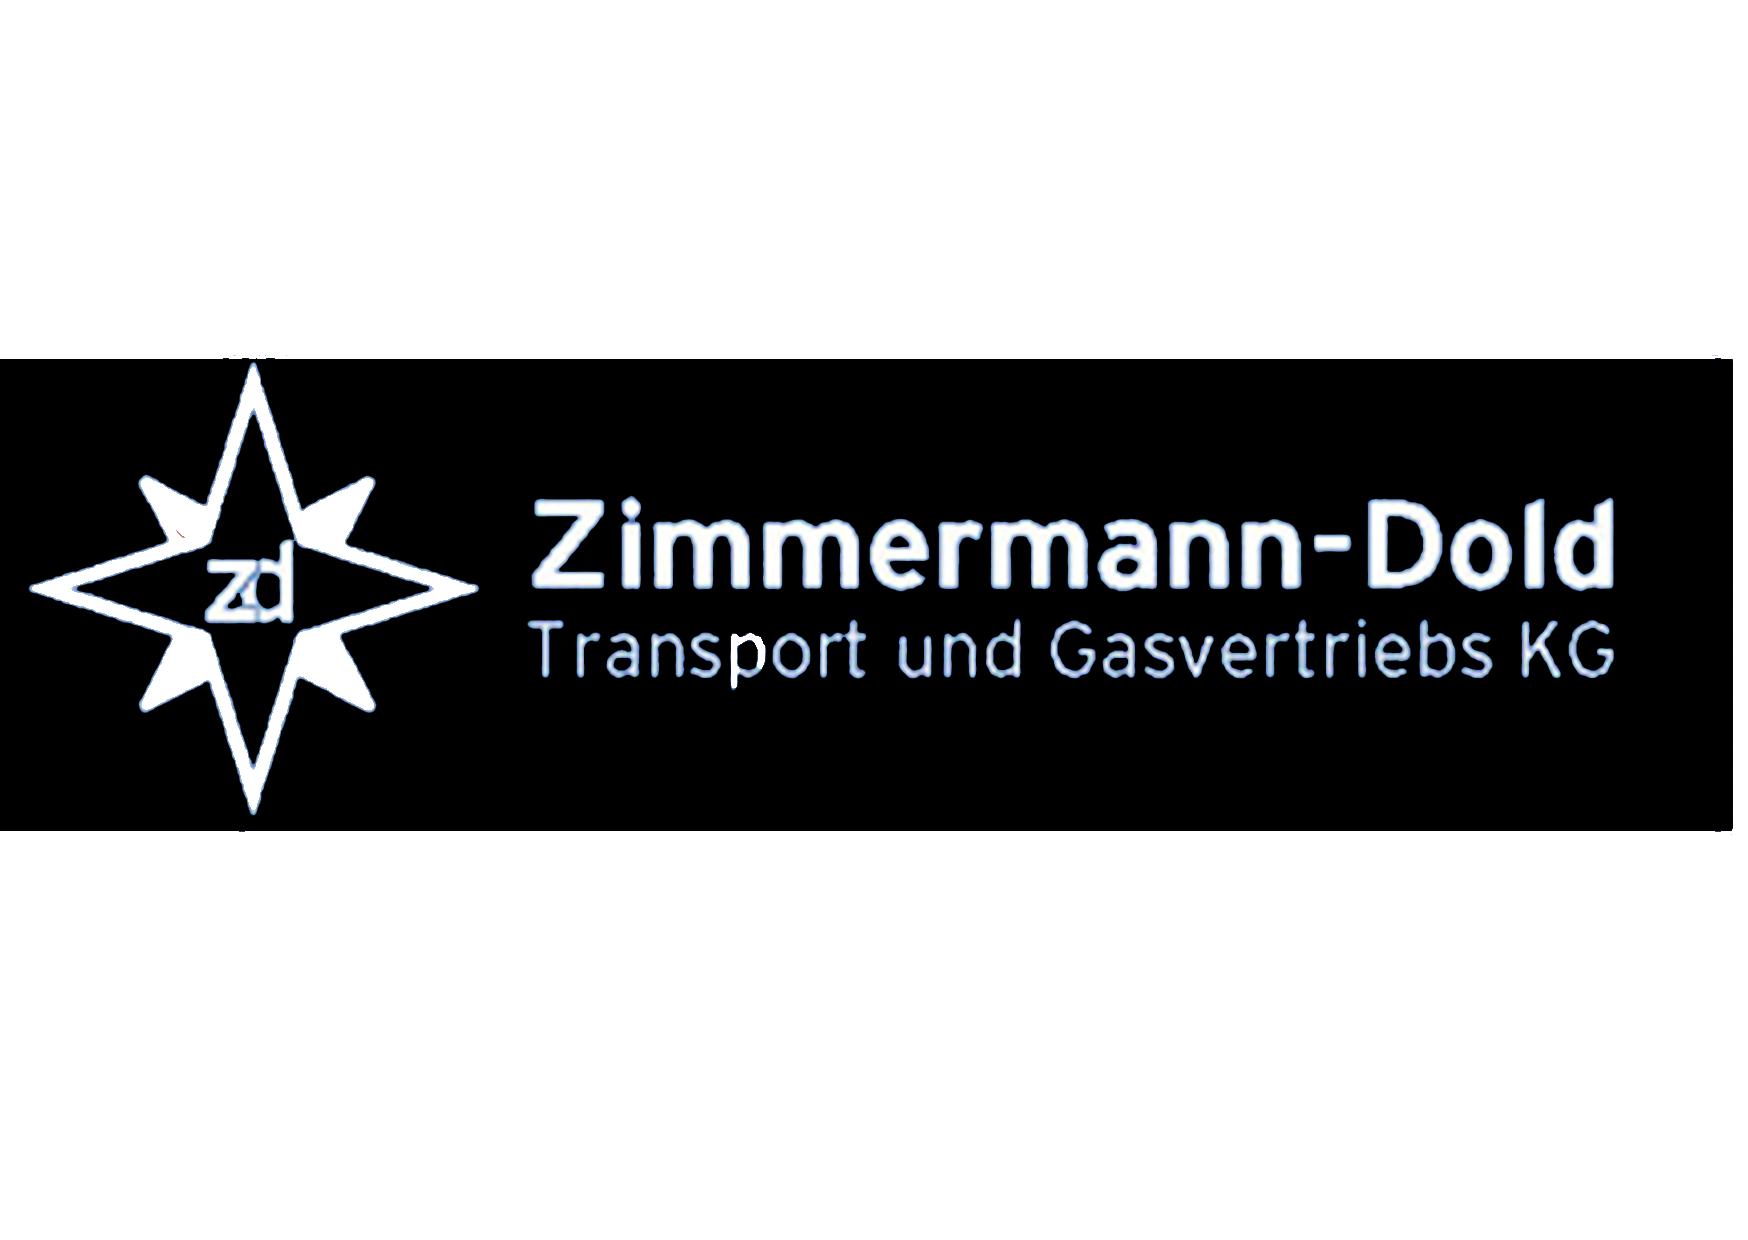 Zimmermann-Dold Transporte